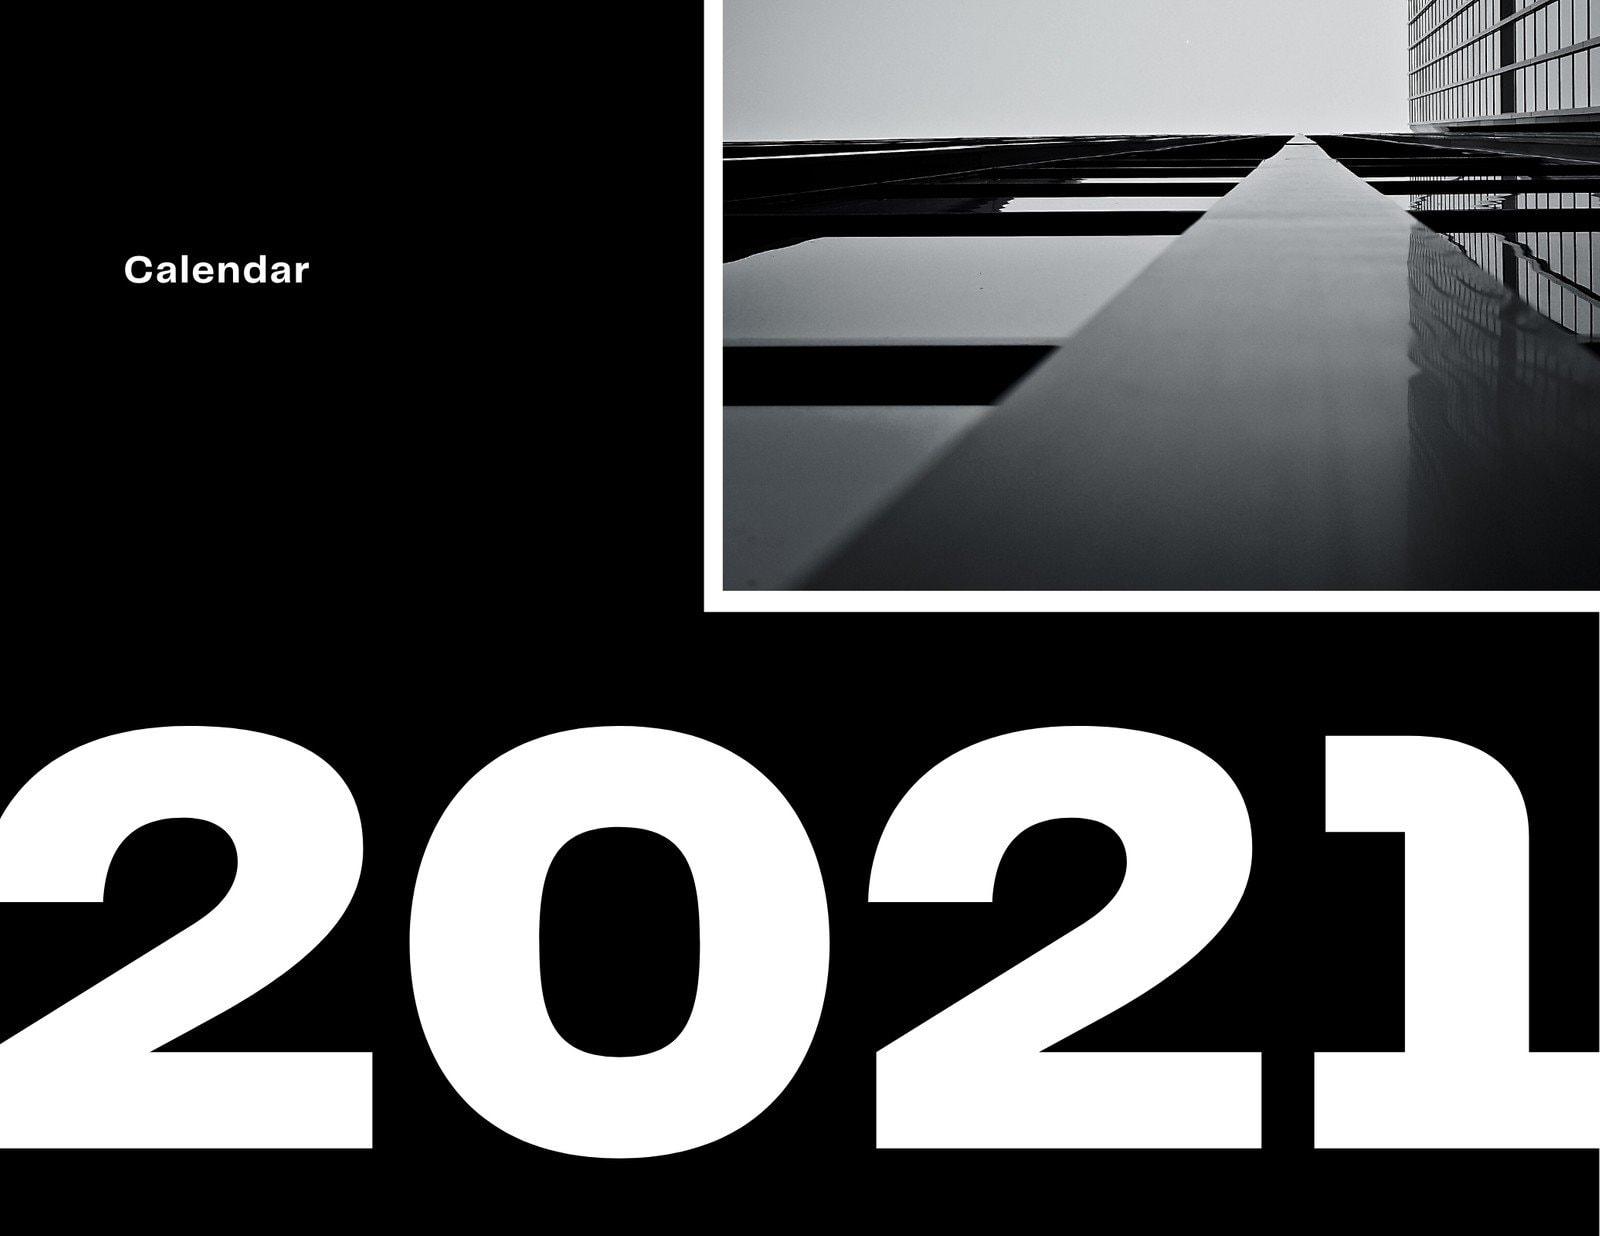 Black and White Modern Minimal Architecture Wall Calendar